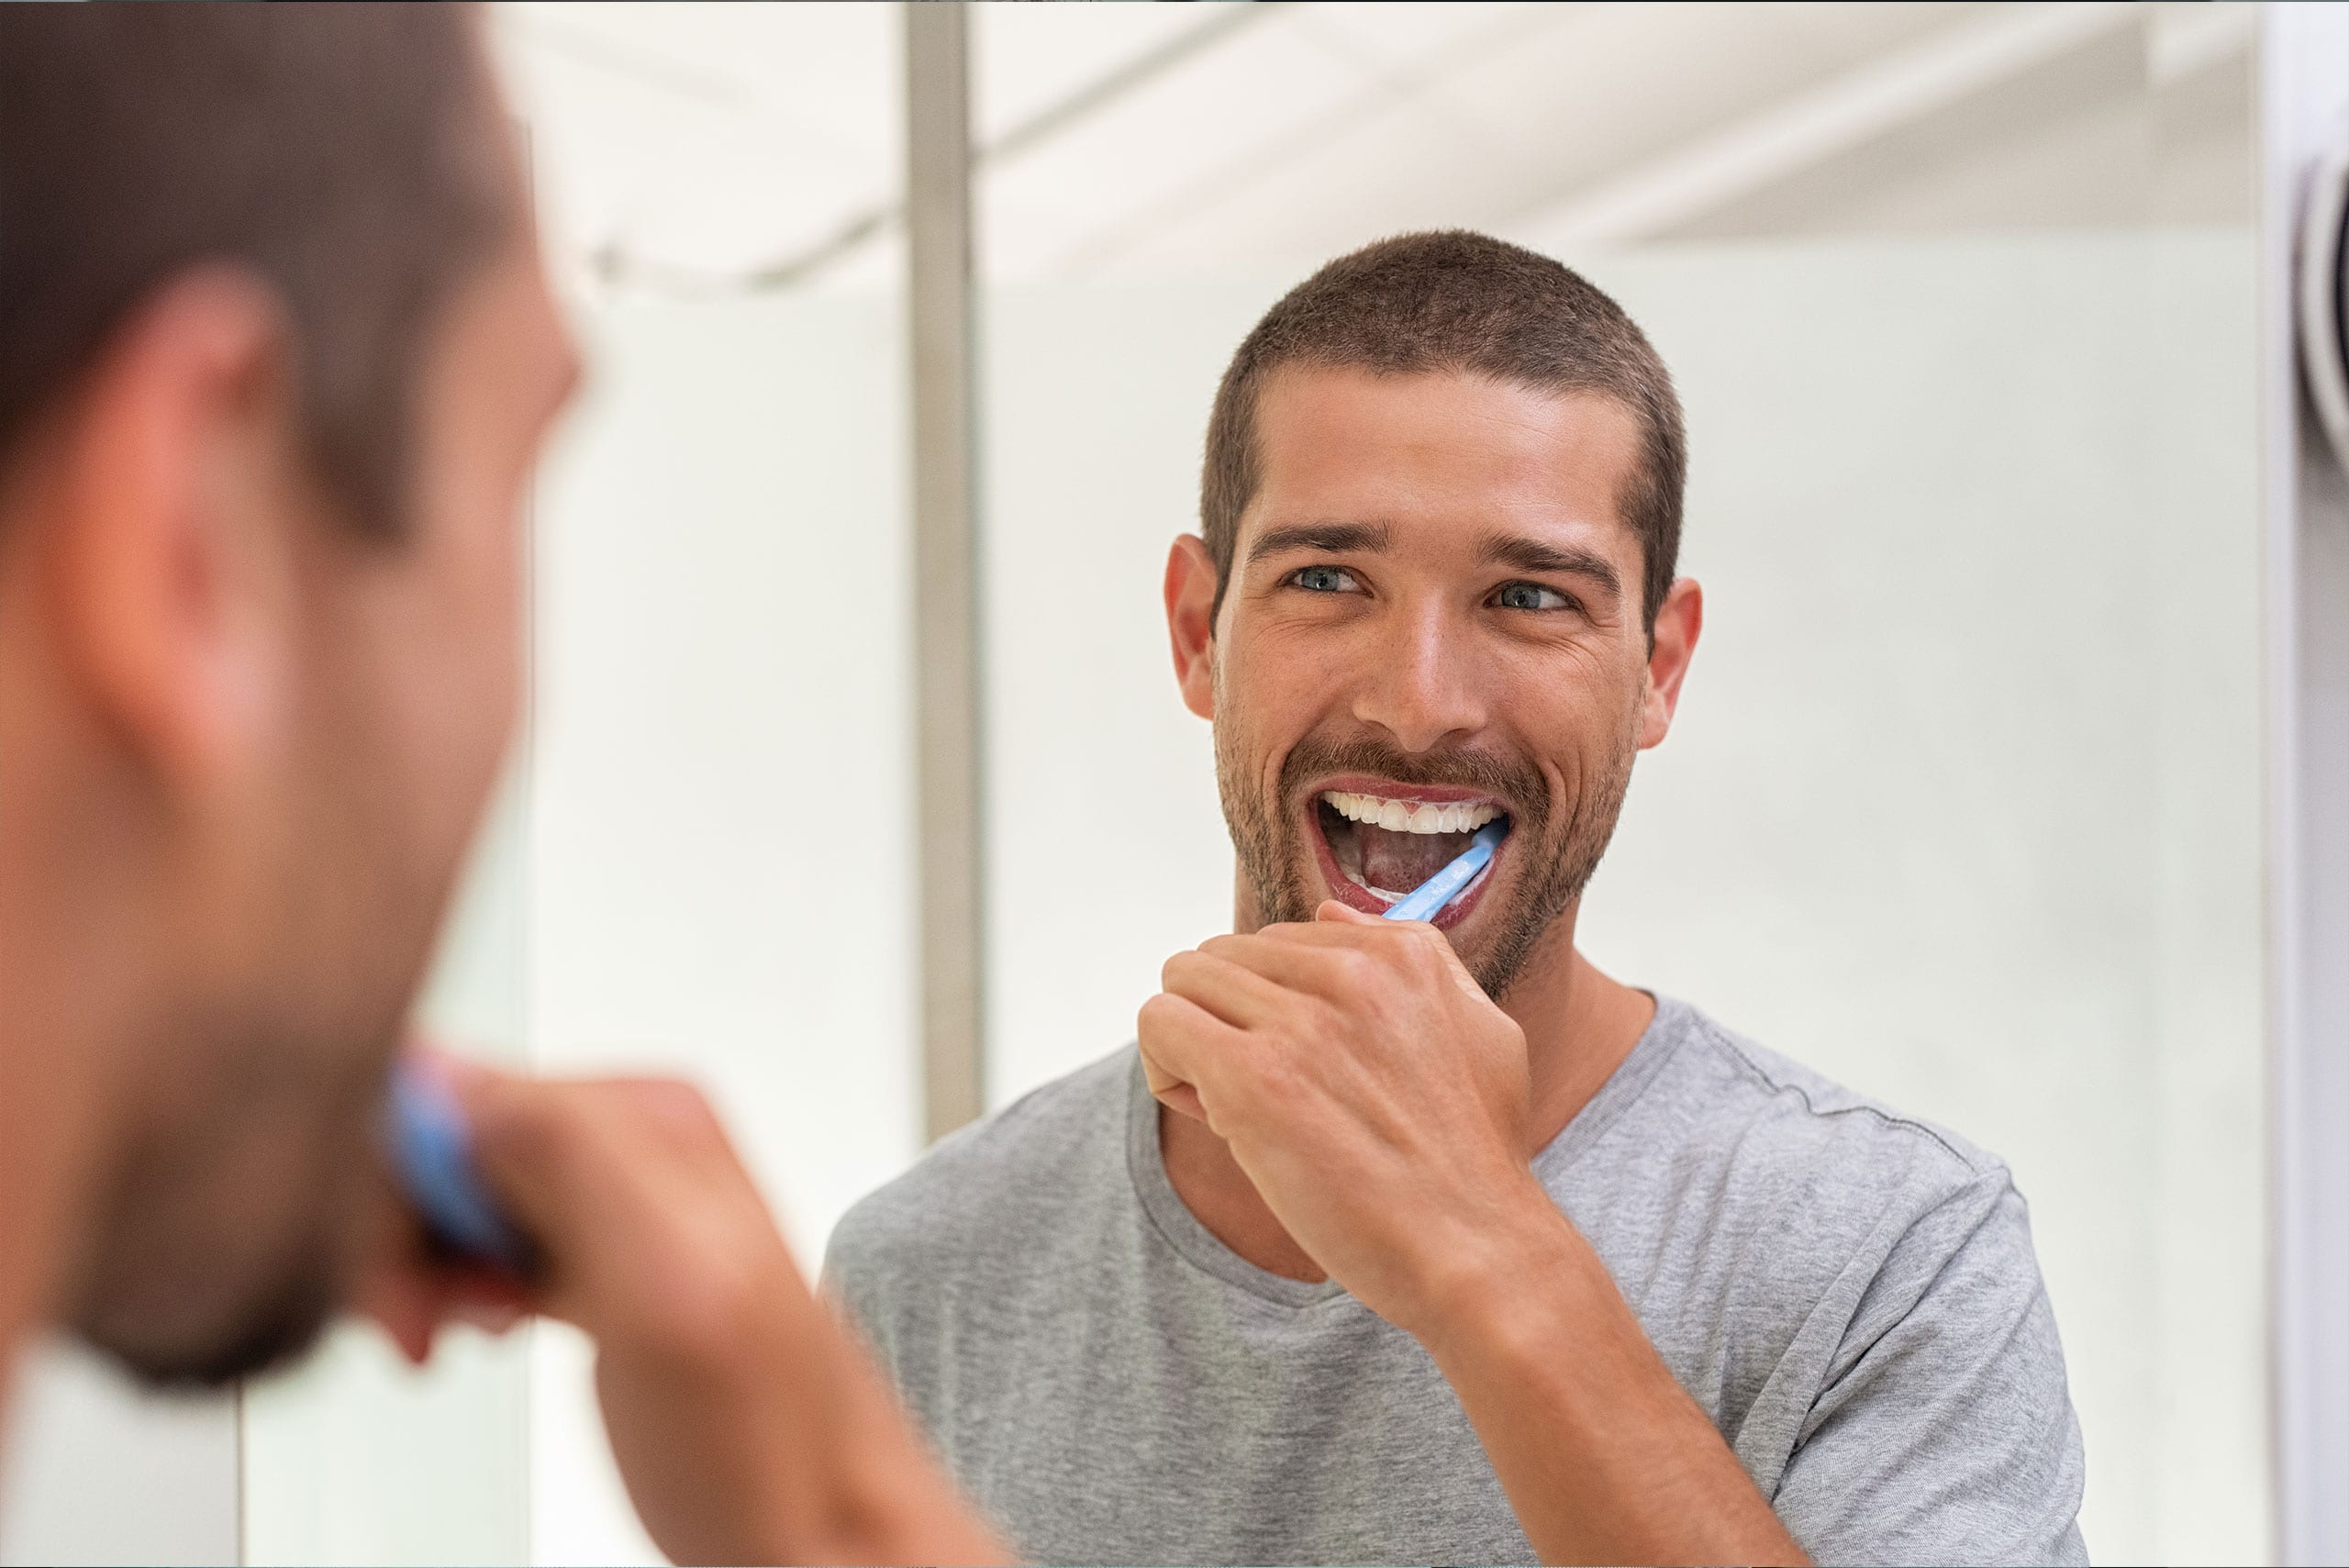 Teeth Whitening - Central Austin Cosmetic Dentist - Treaty Oak Dental